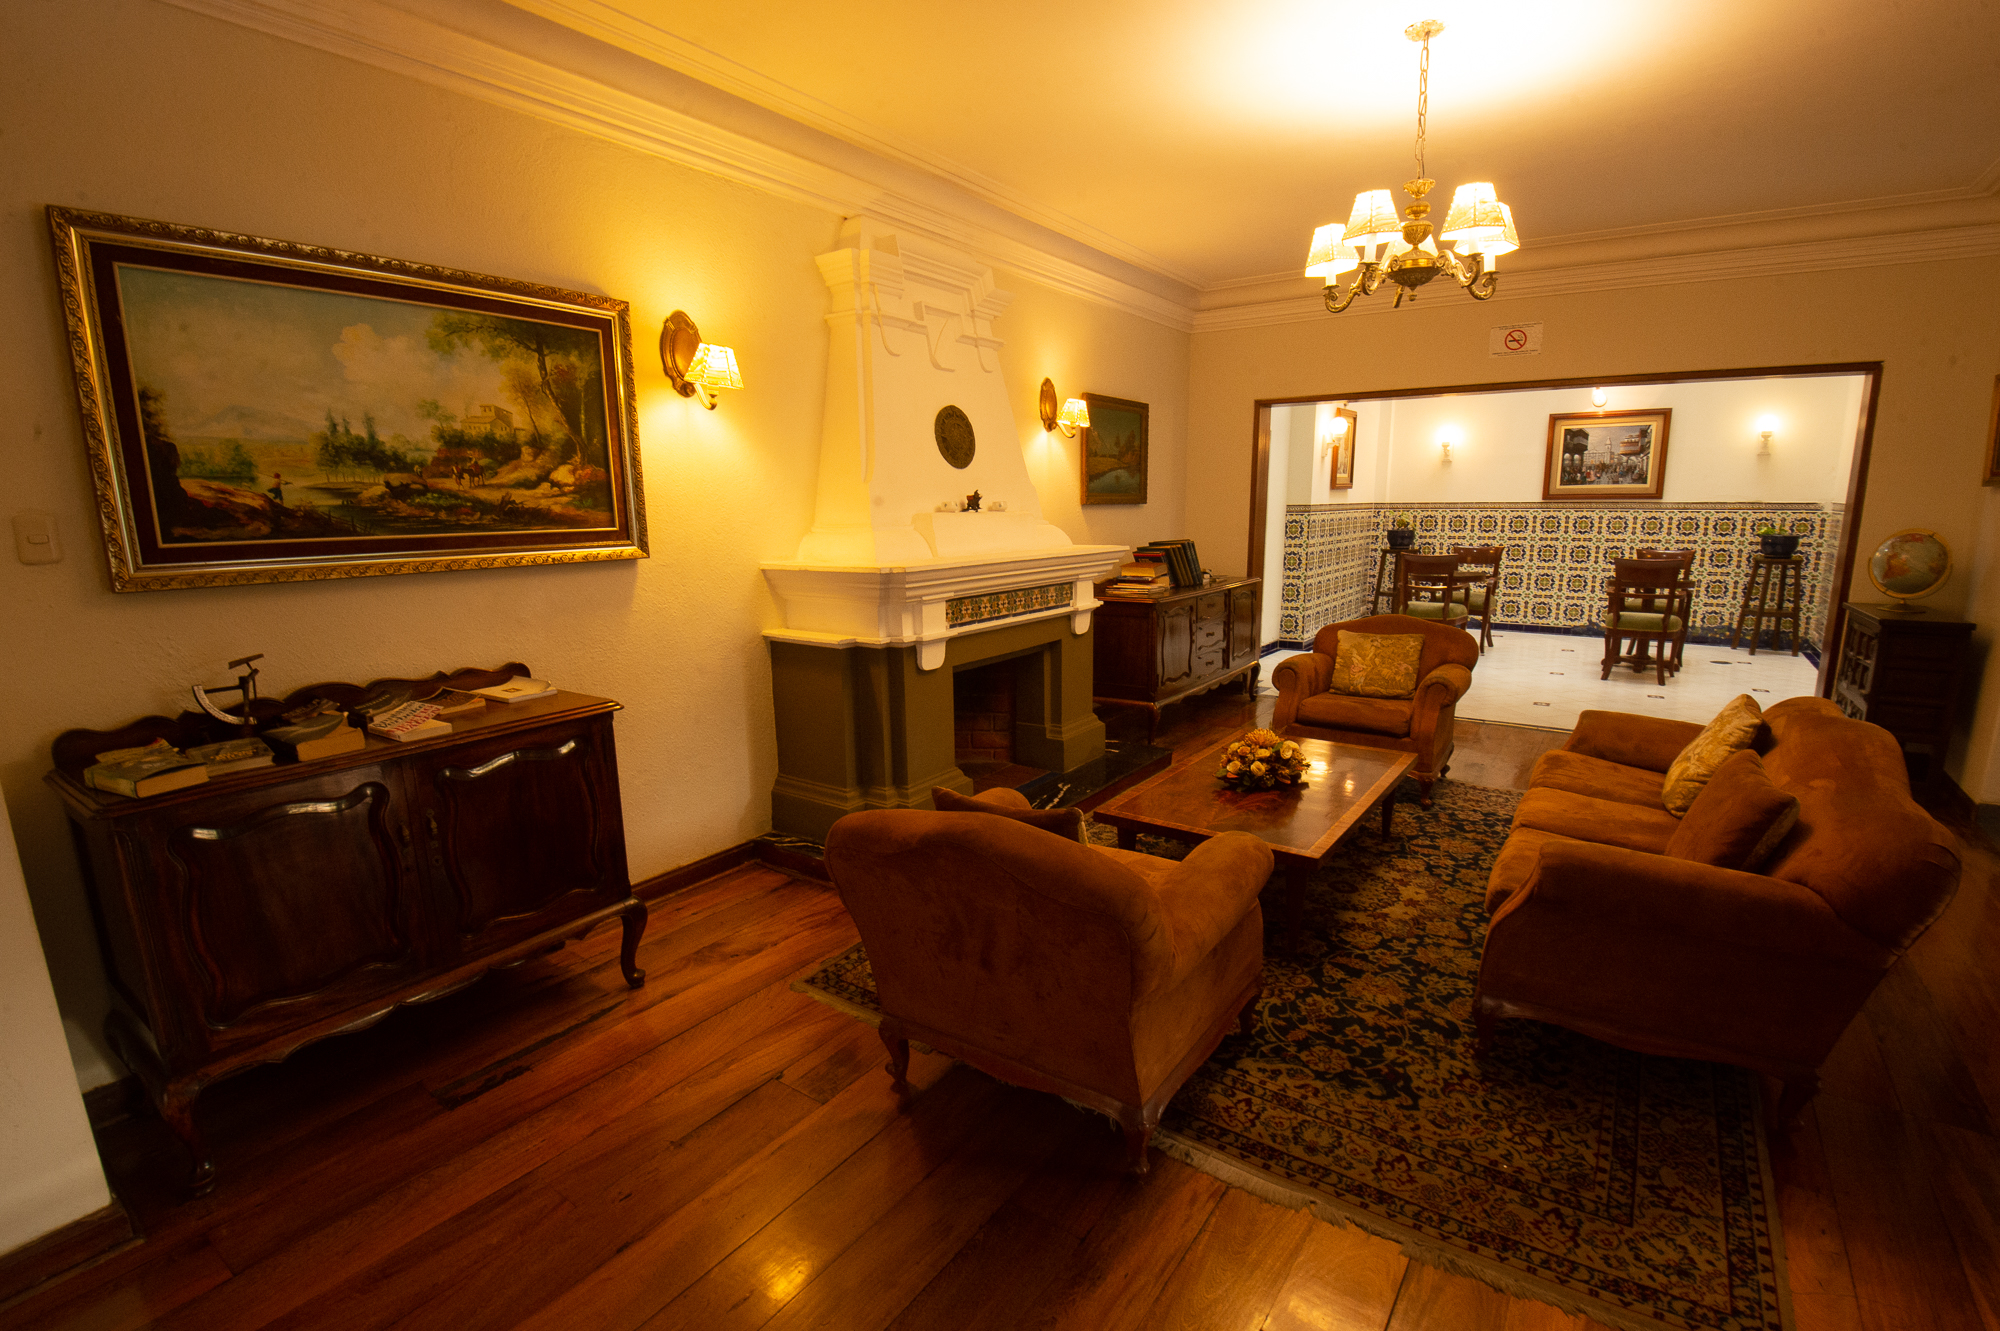 Hotel San Antonio Abad - Internal Lounge II